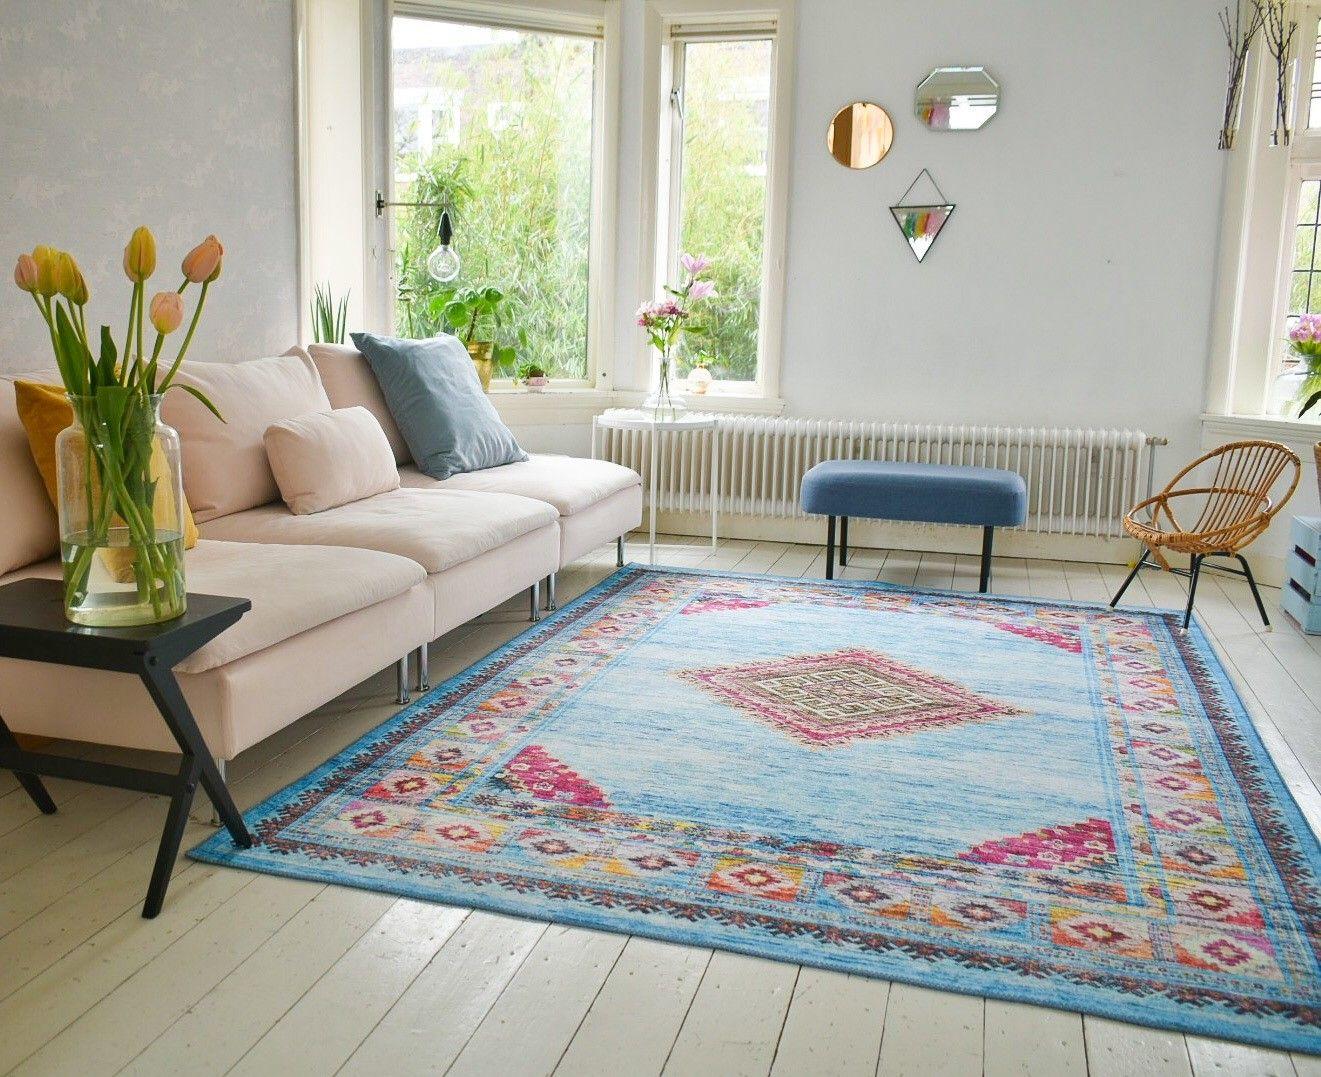 Giveaway Van Rozenkelim : Vintage vloerkleed van rozenkelim vintage vloerkleed rugs